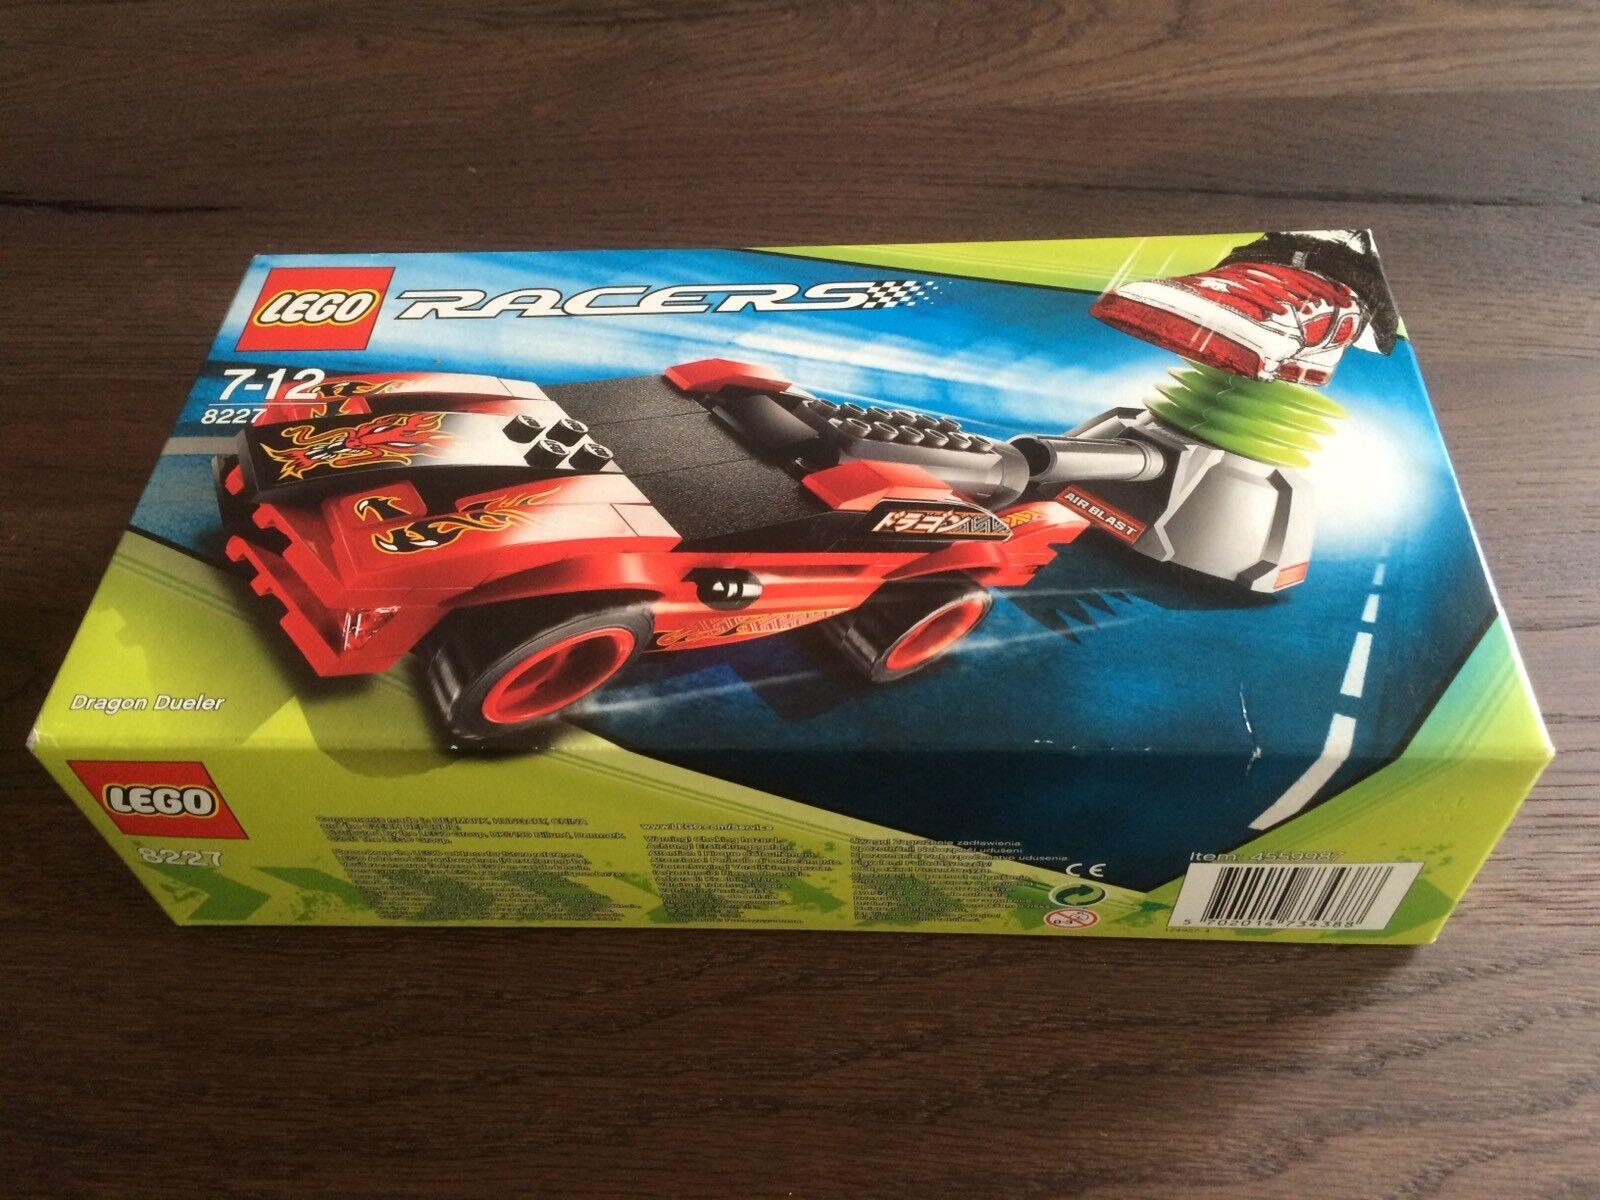 LEGO 8227 Racers Drachen Rennwagen NEU&OVP